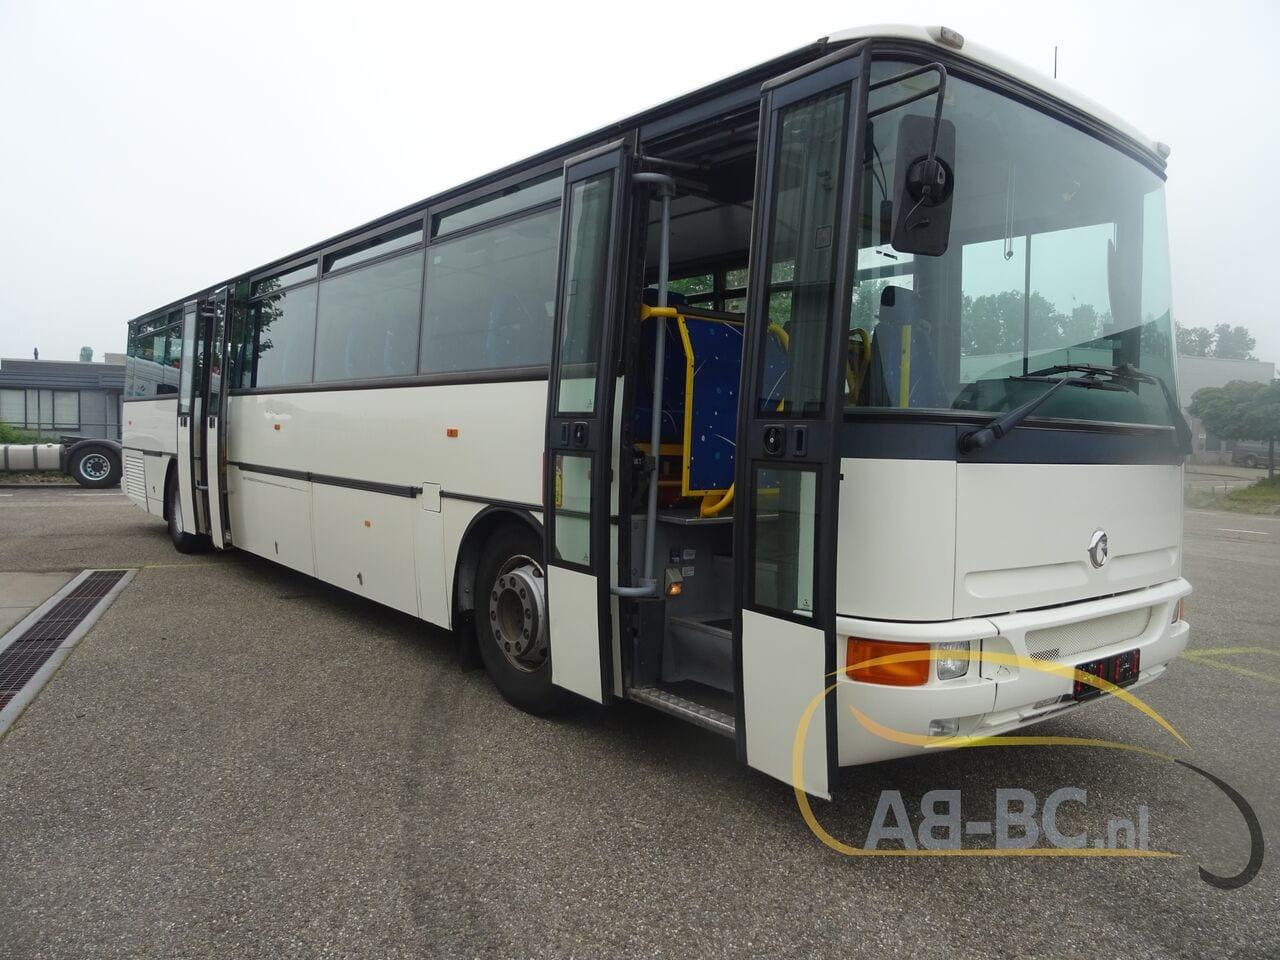 interurban-busIVECO-Irisbus-Recreo-64-Seats---1626159828943088372_big_58cdf0451b230154c158eea1cecd966f--21071309575983154500